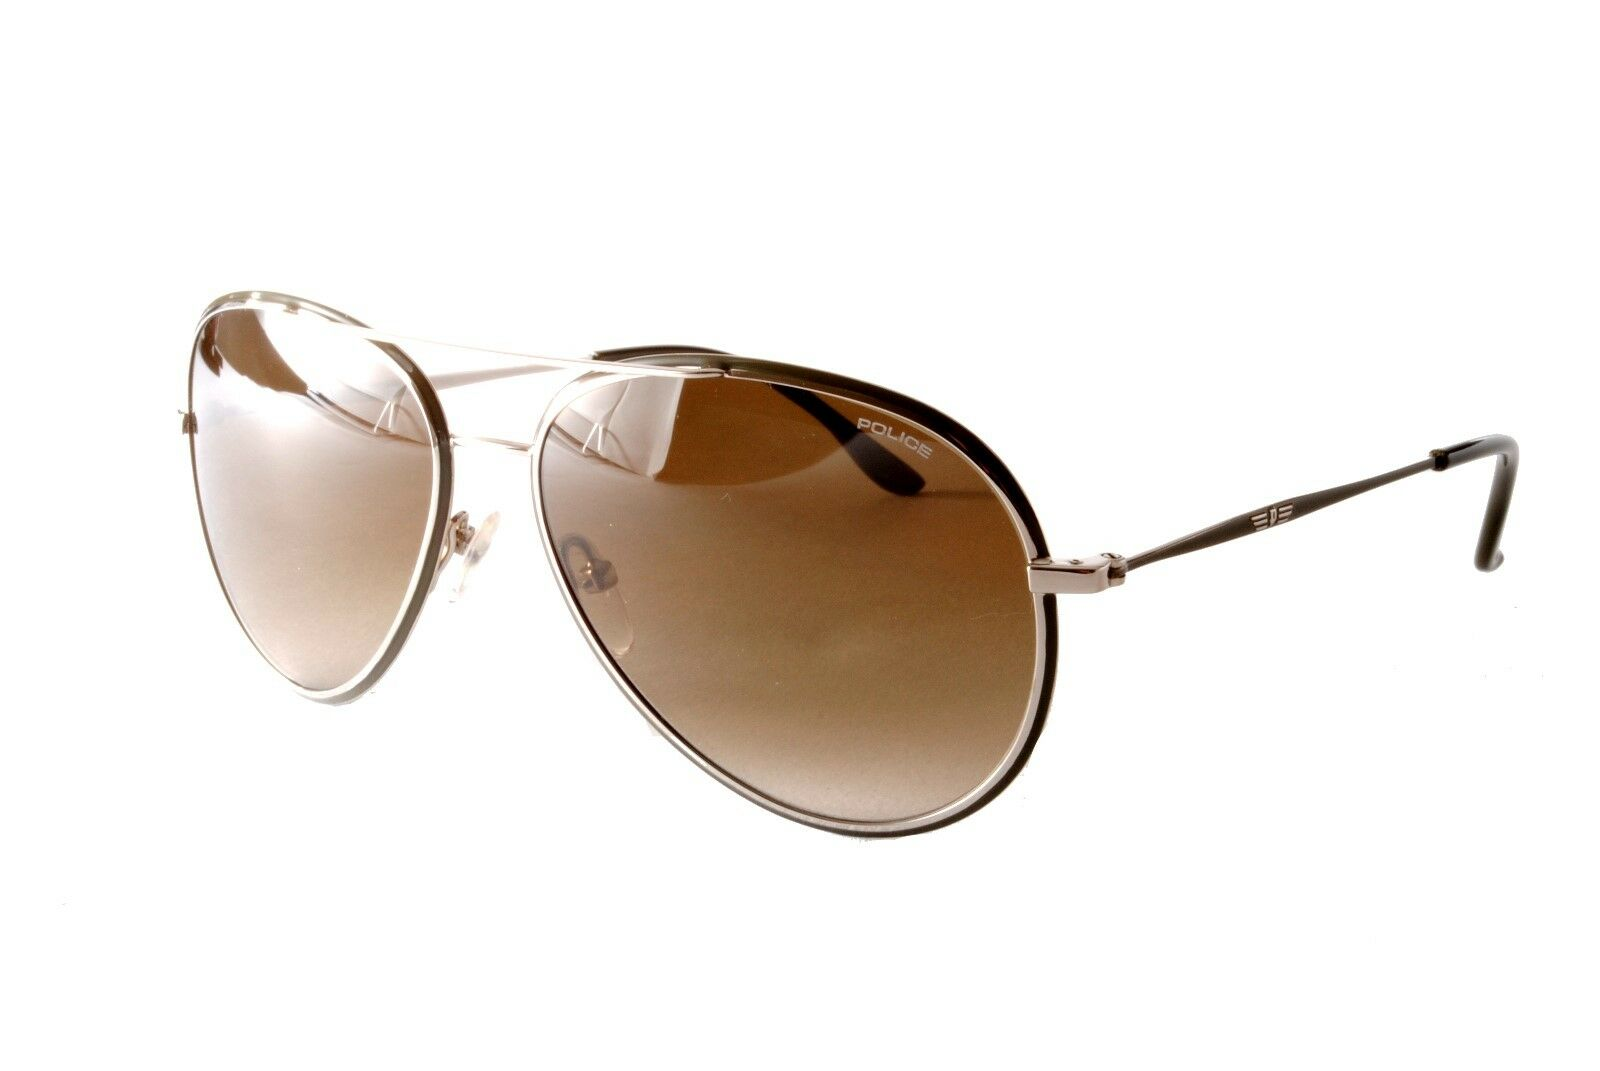 Police Sunglasses S8299M 0523 Silver Green Brown Gradient